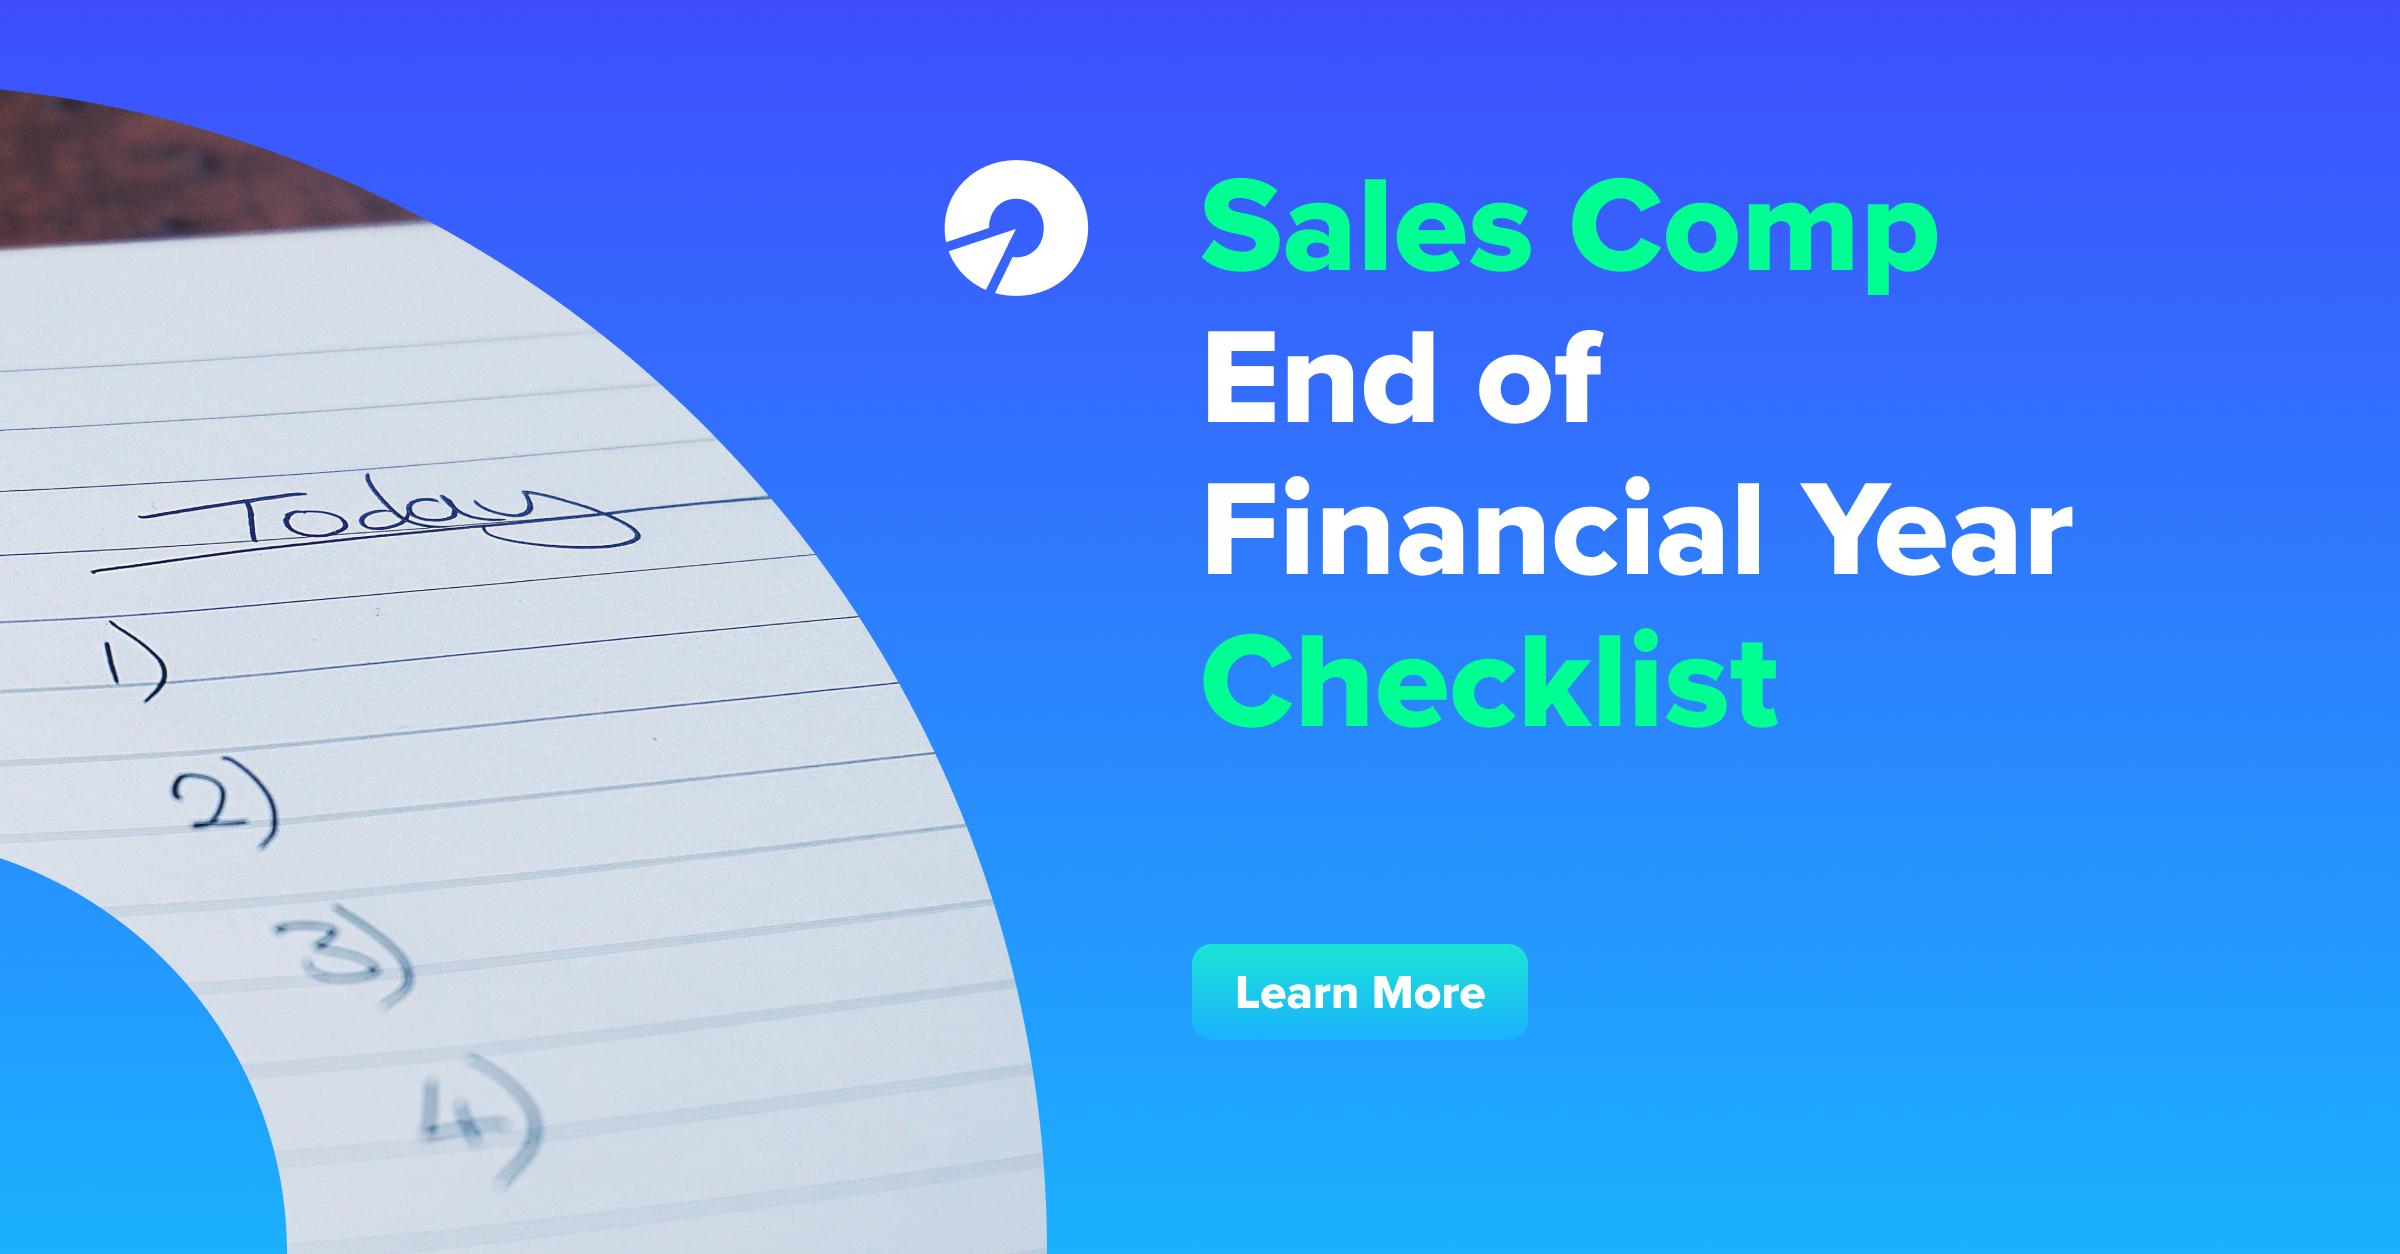 Sales Comp End of Financial Year Checklist